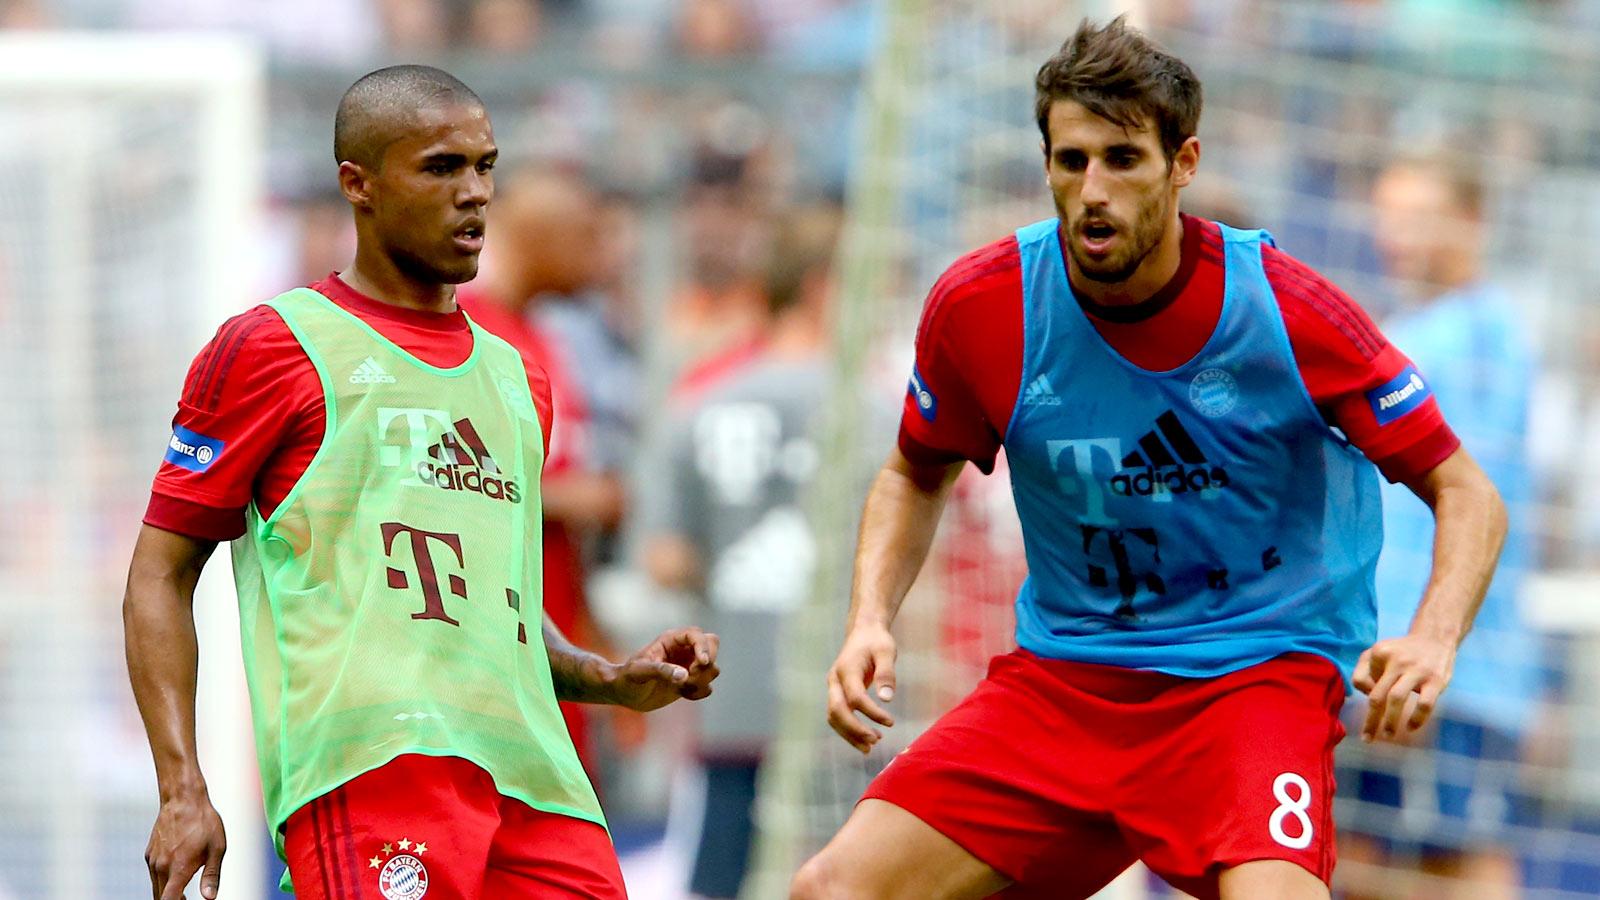 Bayern Munich's Javi Martinez eyeing return from injury